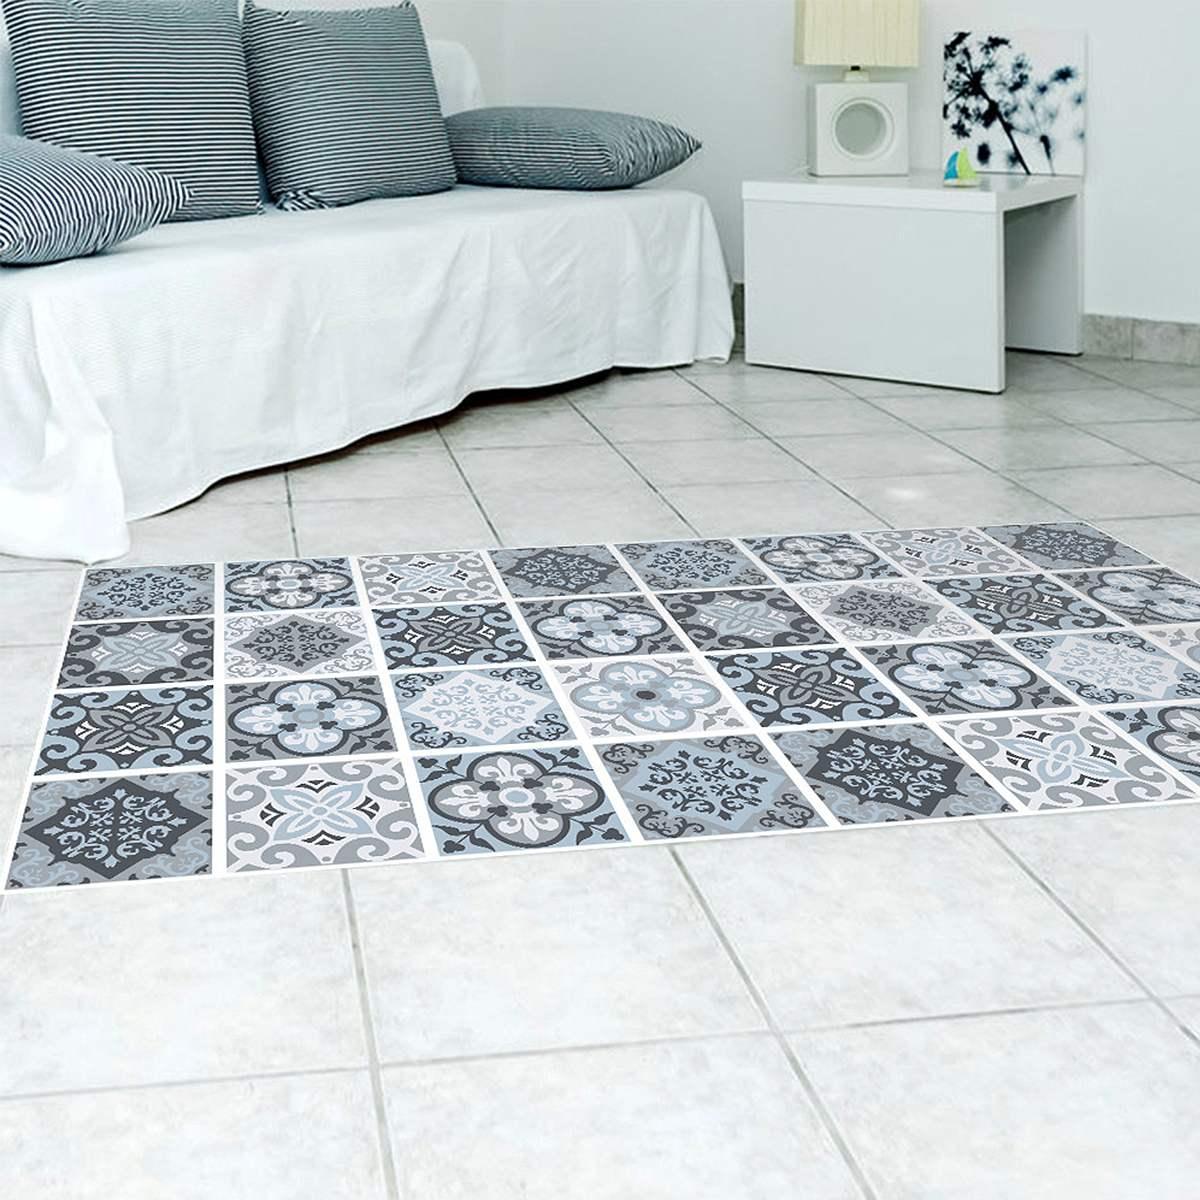 Fashion Home Decor PVC Floor Living Room Bathroom Mat Waterproof ...